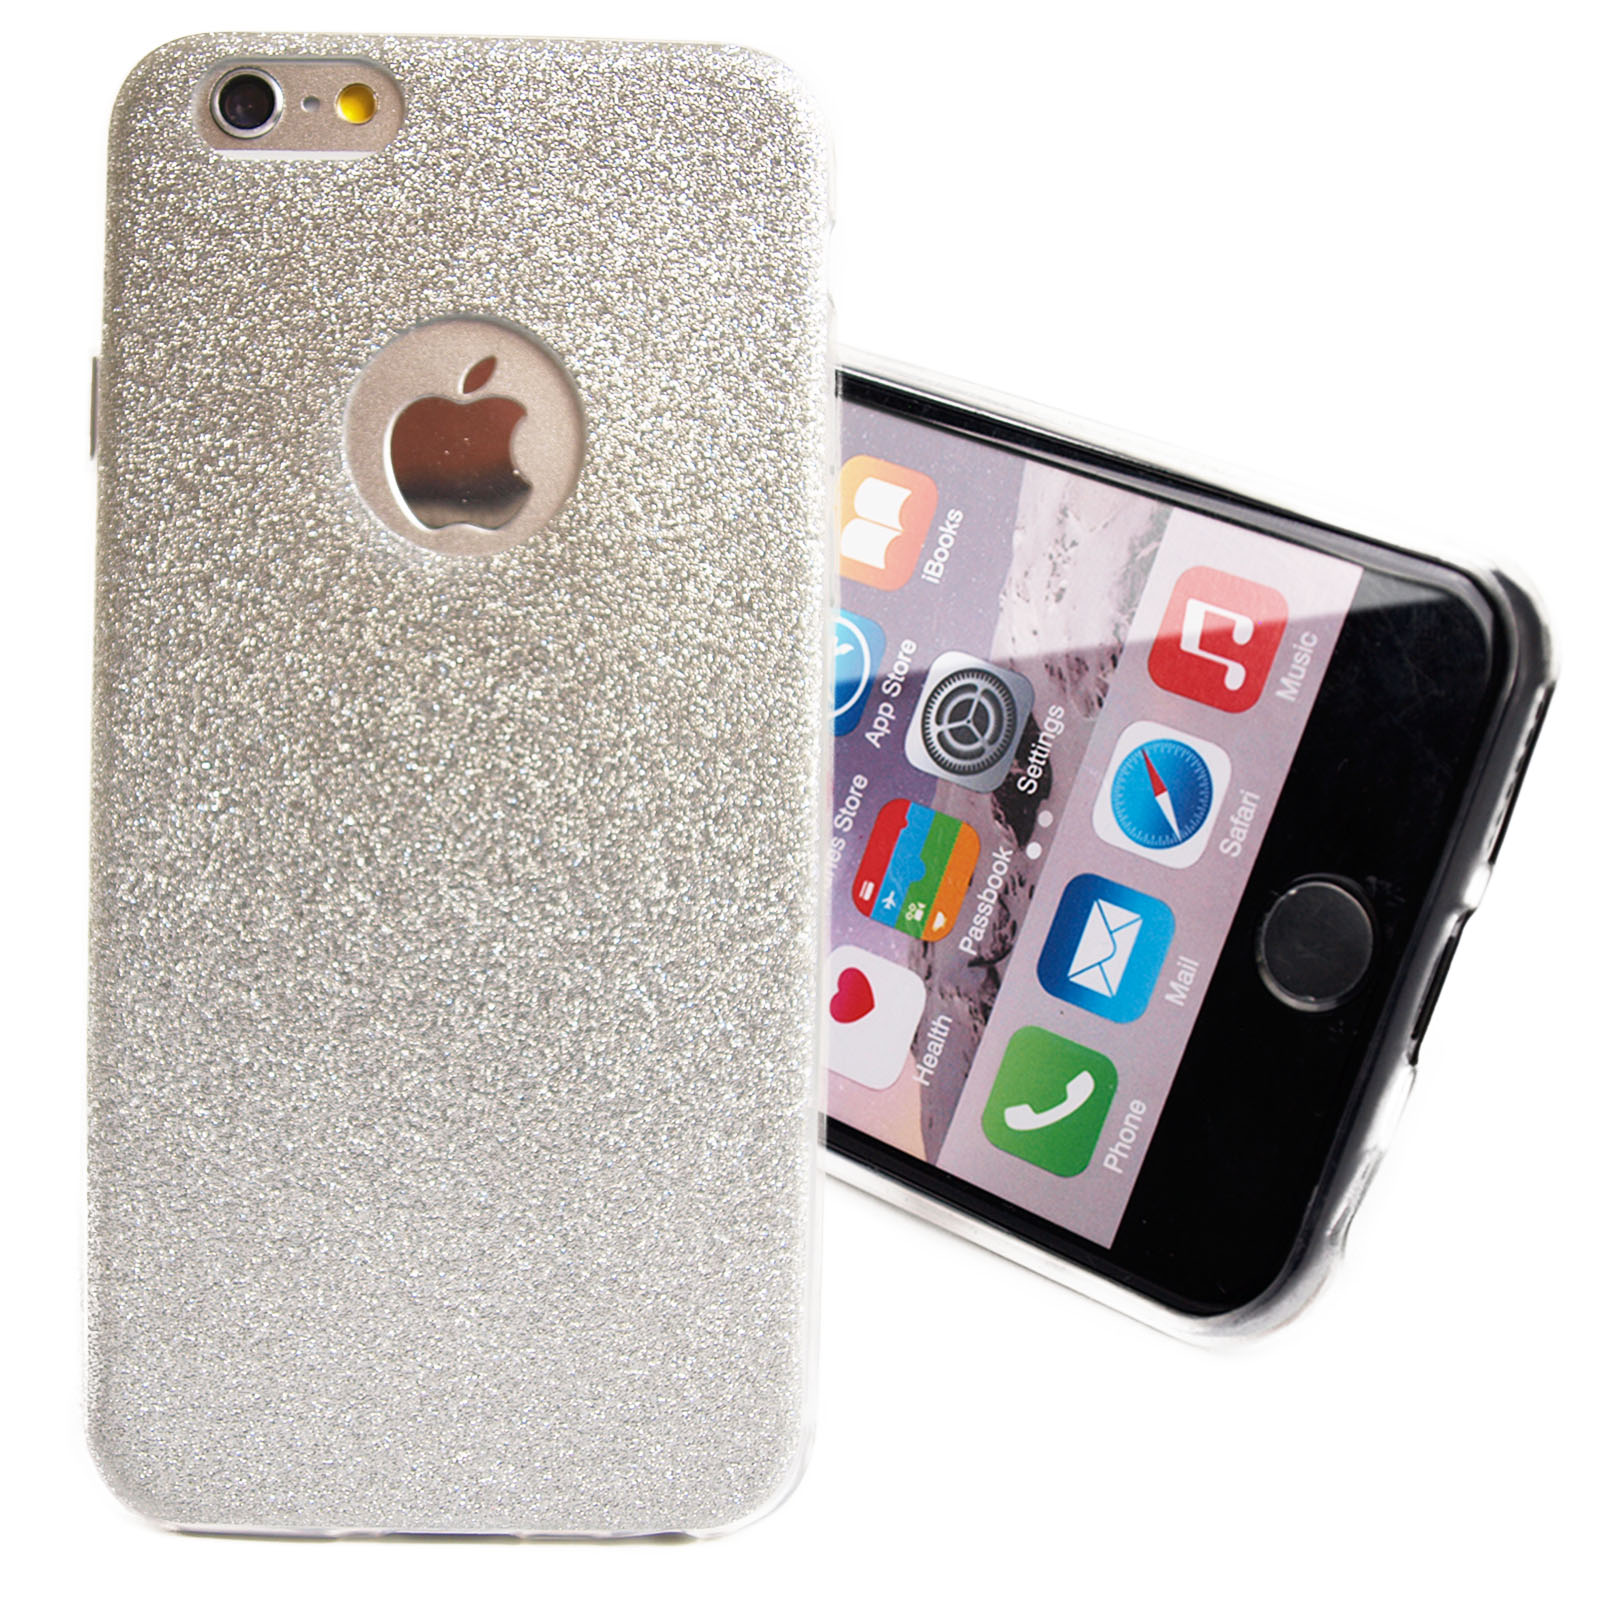 iphone 7 8 plus schutz h lle case diamant blumen glitzer. Black Bedroom Furniture Sets. Home Design Ideas